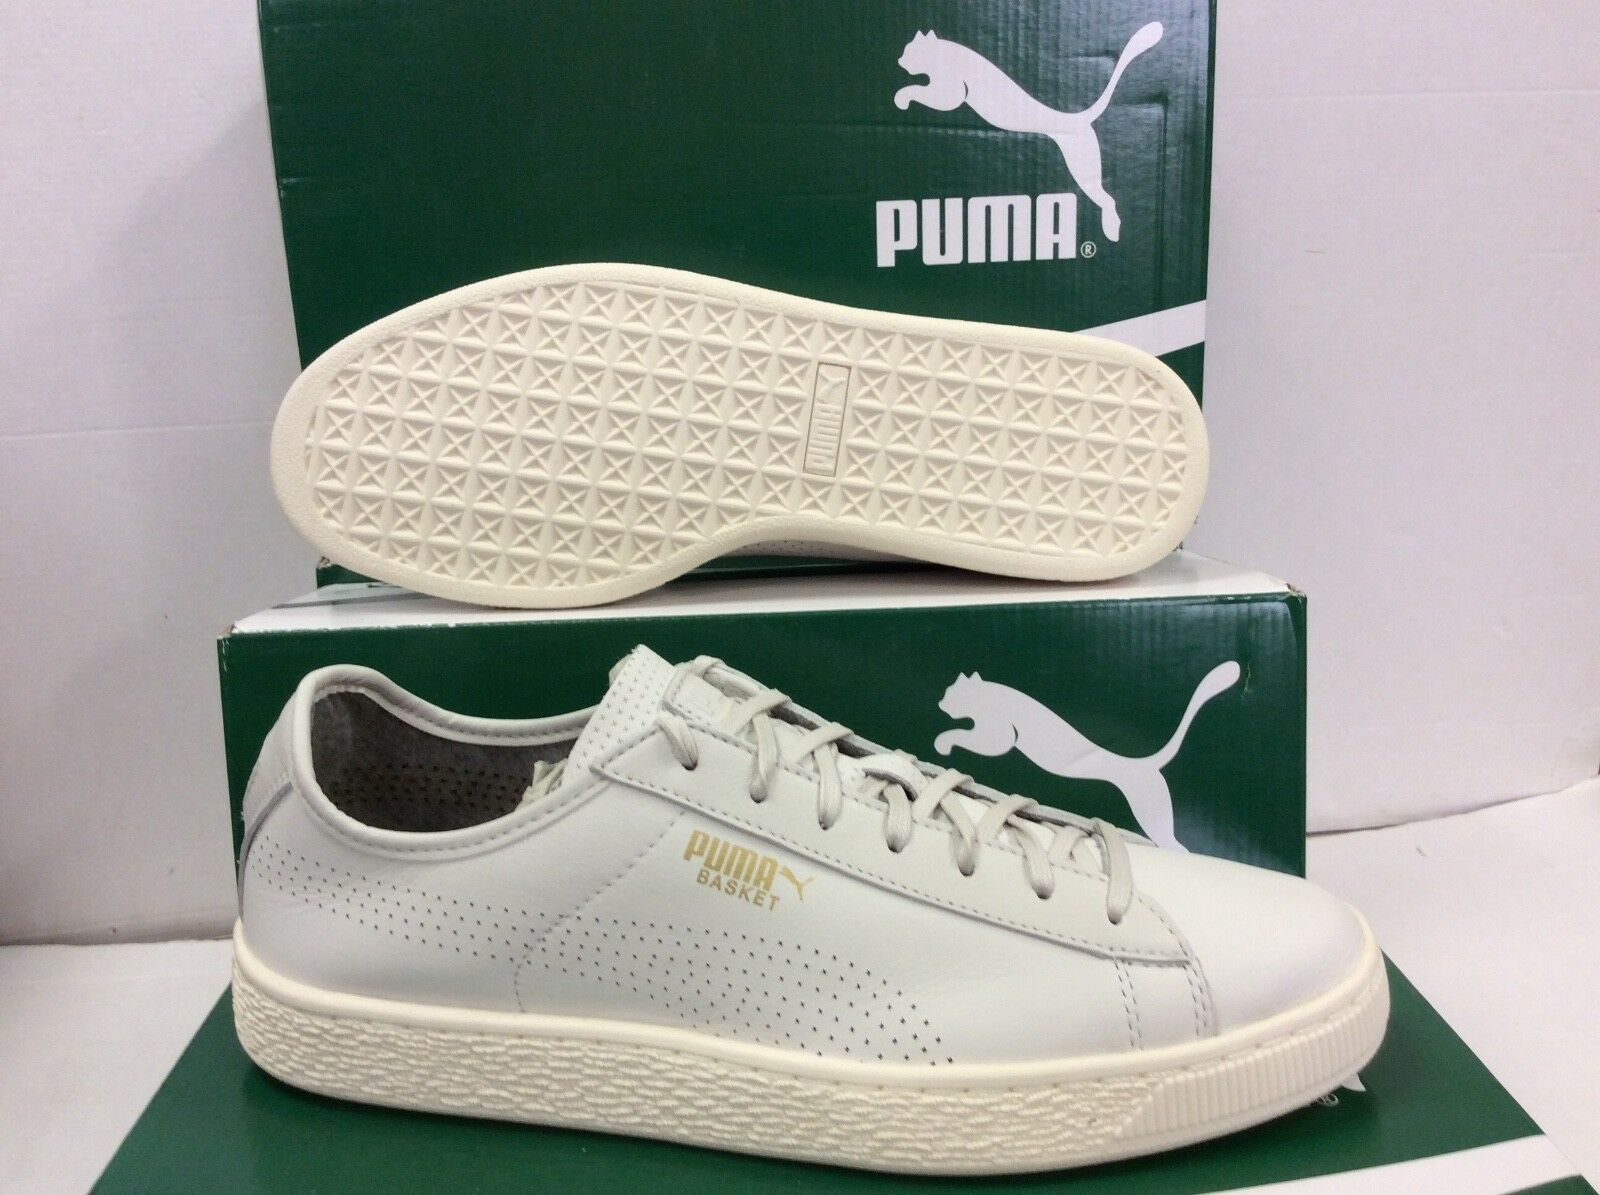 Puma Cestino Classico Morbida Pelle Da Uomo Scarpe da ginnastica Scarpe da ginnastica, Taglia /EU 42